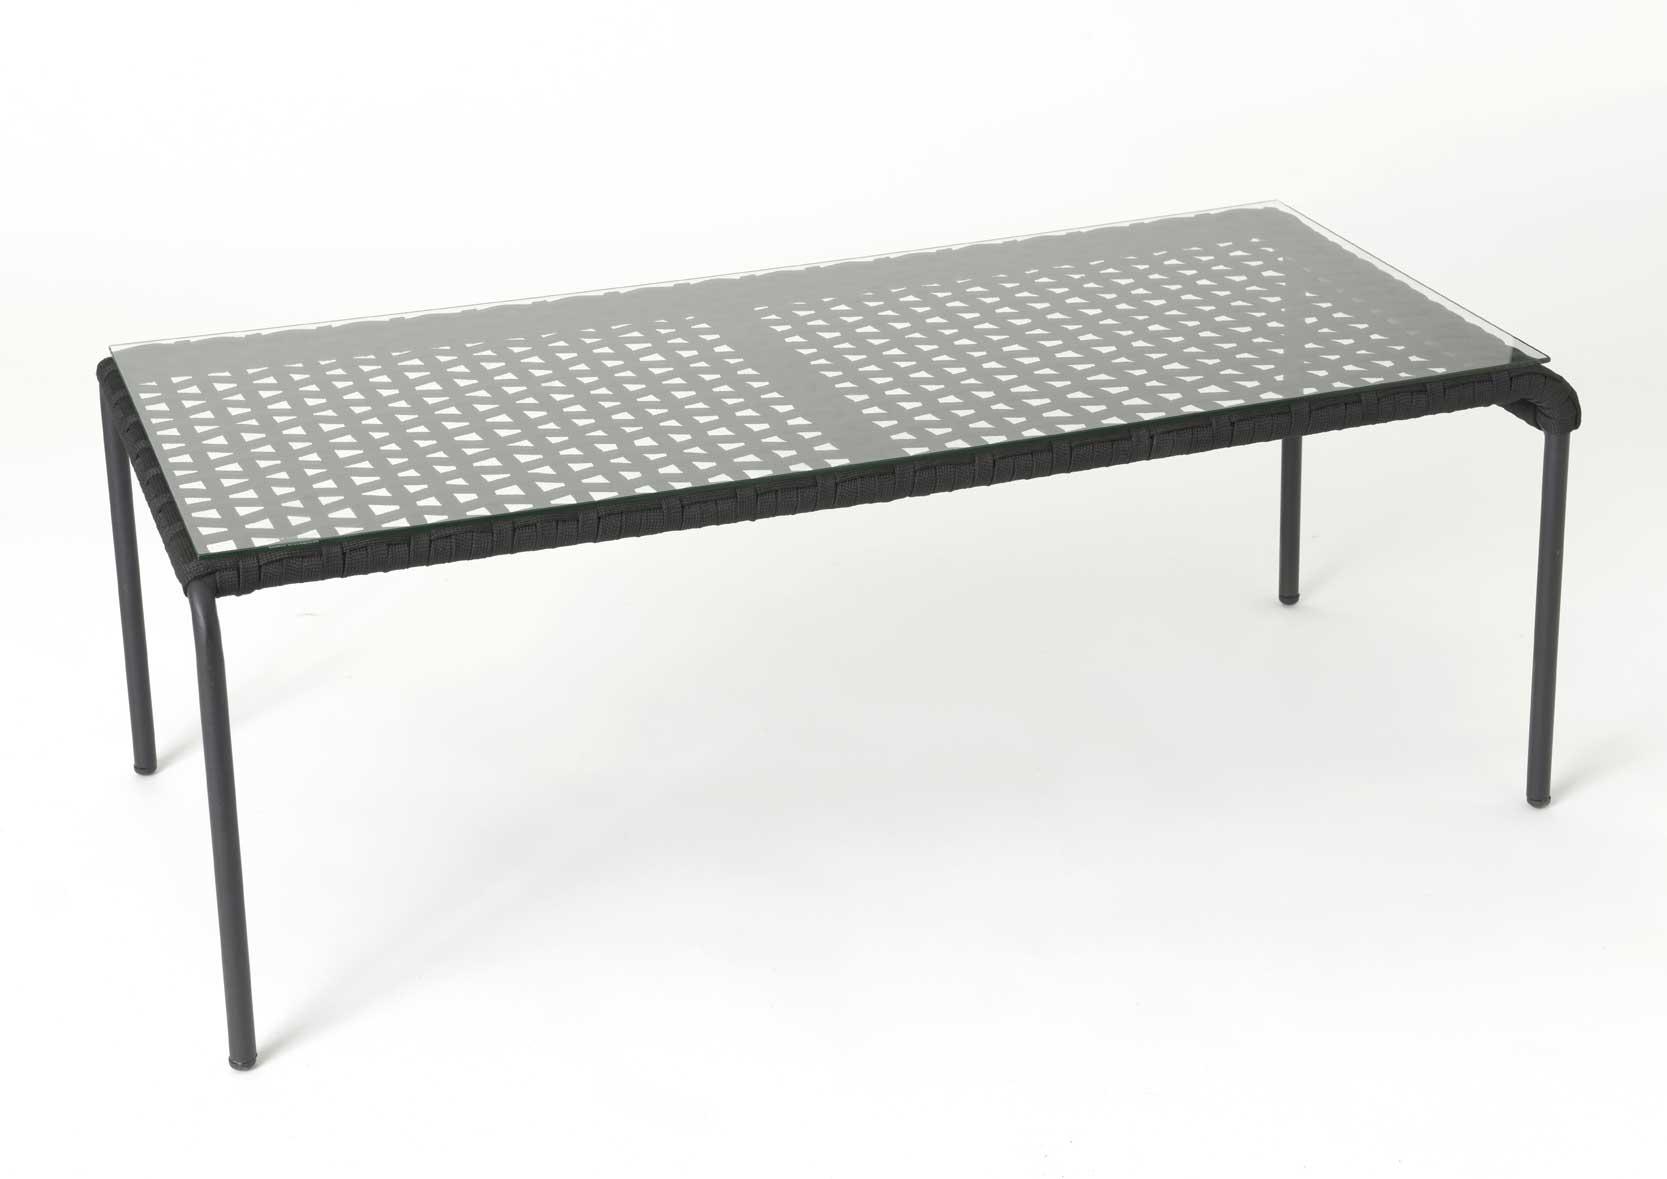 table basse en aluminium et corde. Black Bedroom Furniture Sets. Home Design Ideas